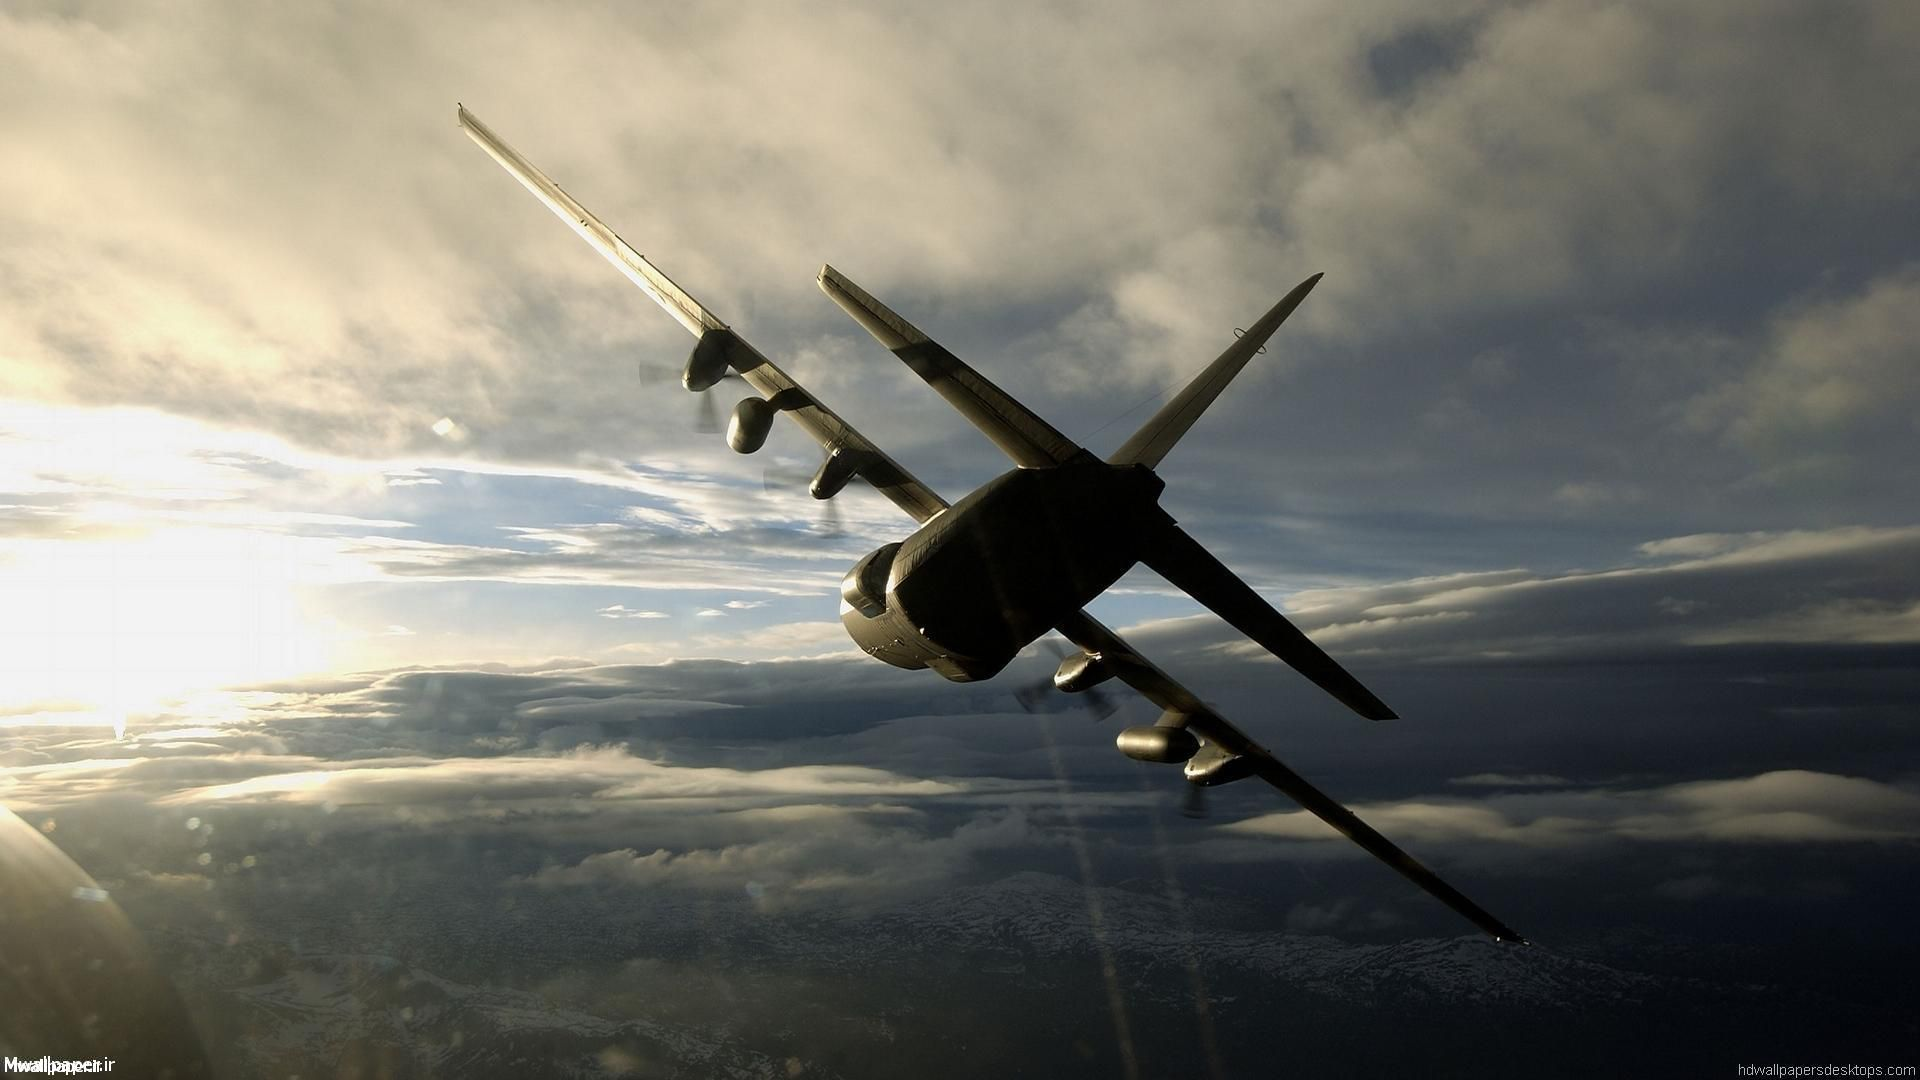 والپیپر هواپیما در آسمان آبی